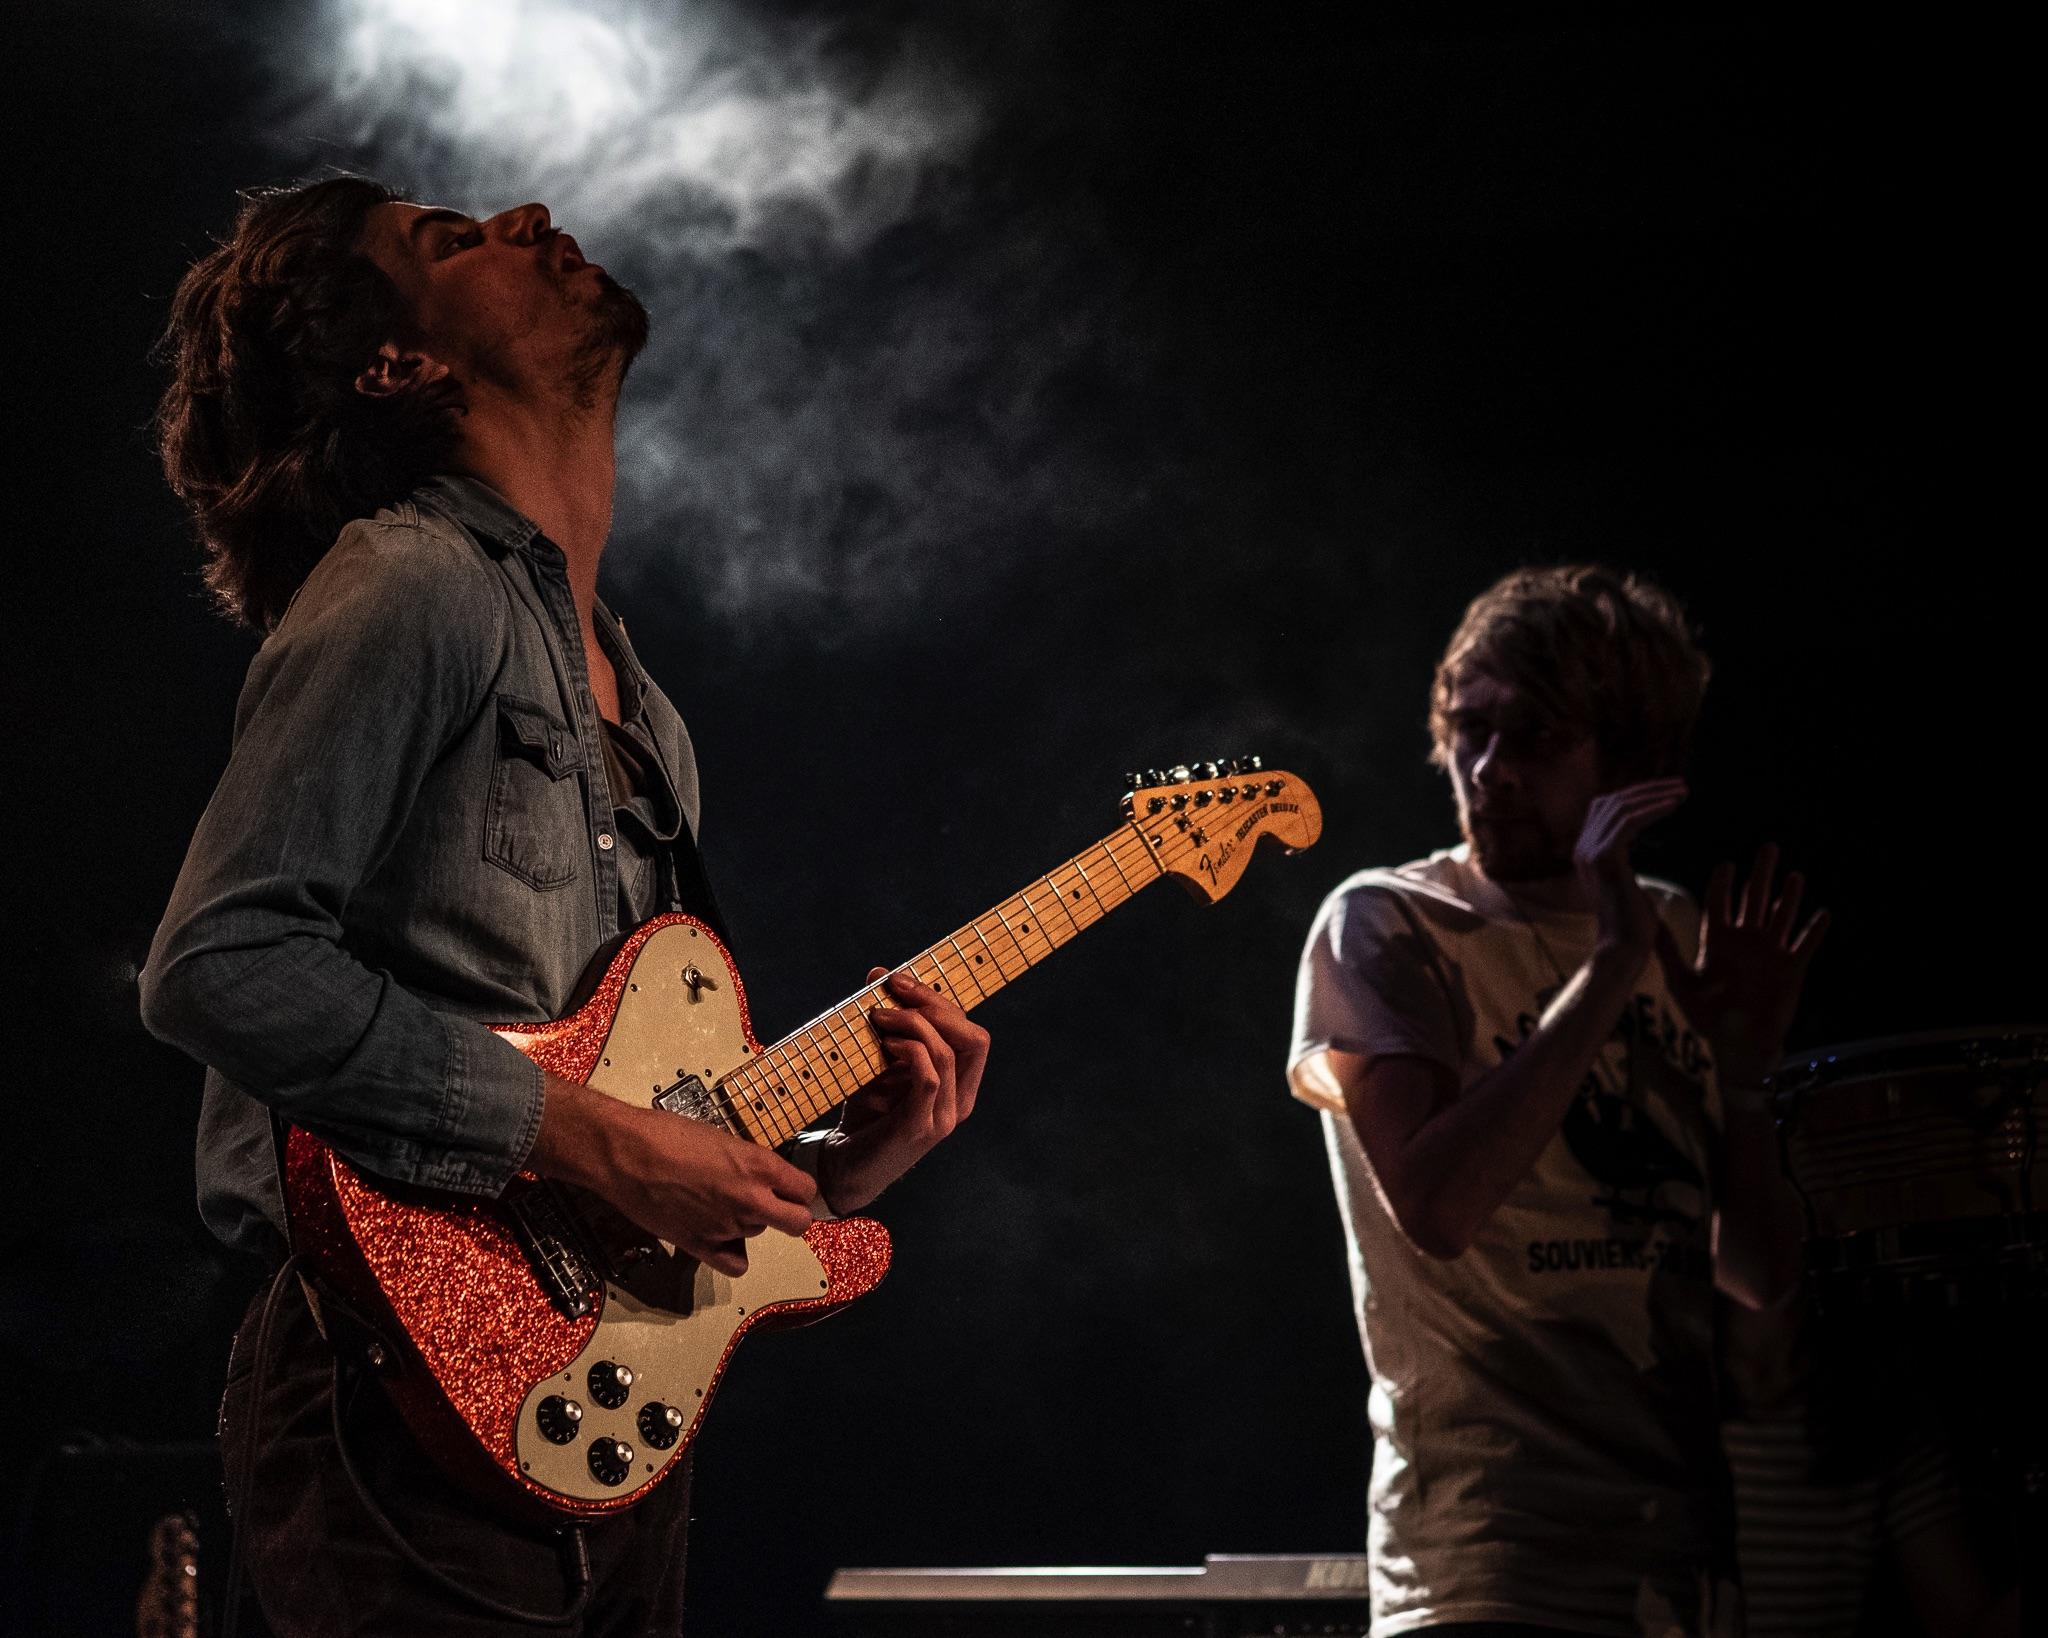 [La Bobine] L'Eclair + Indianizer 01/02